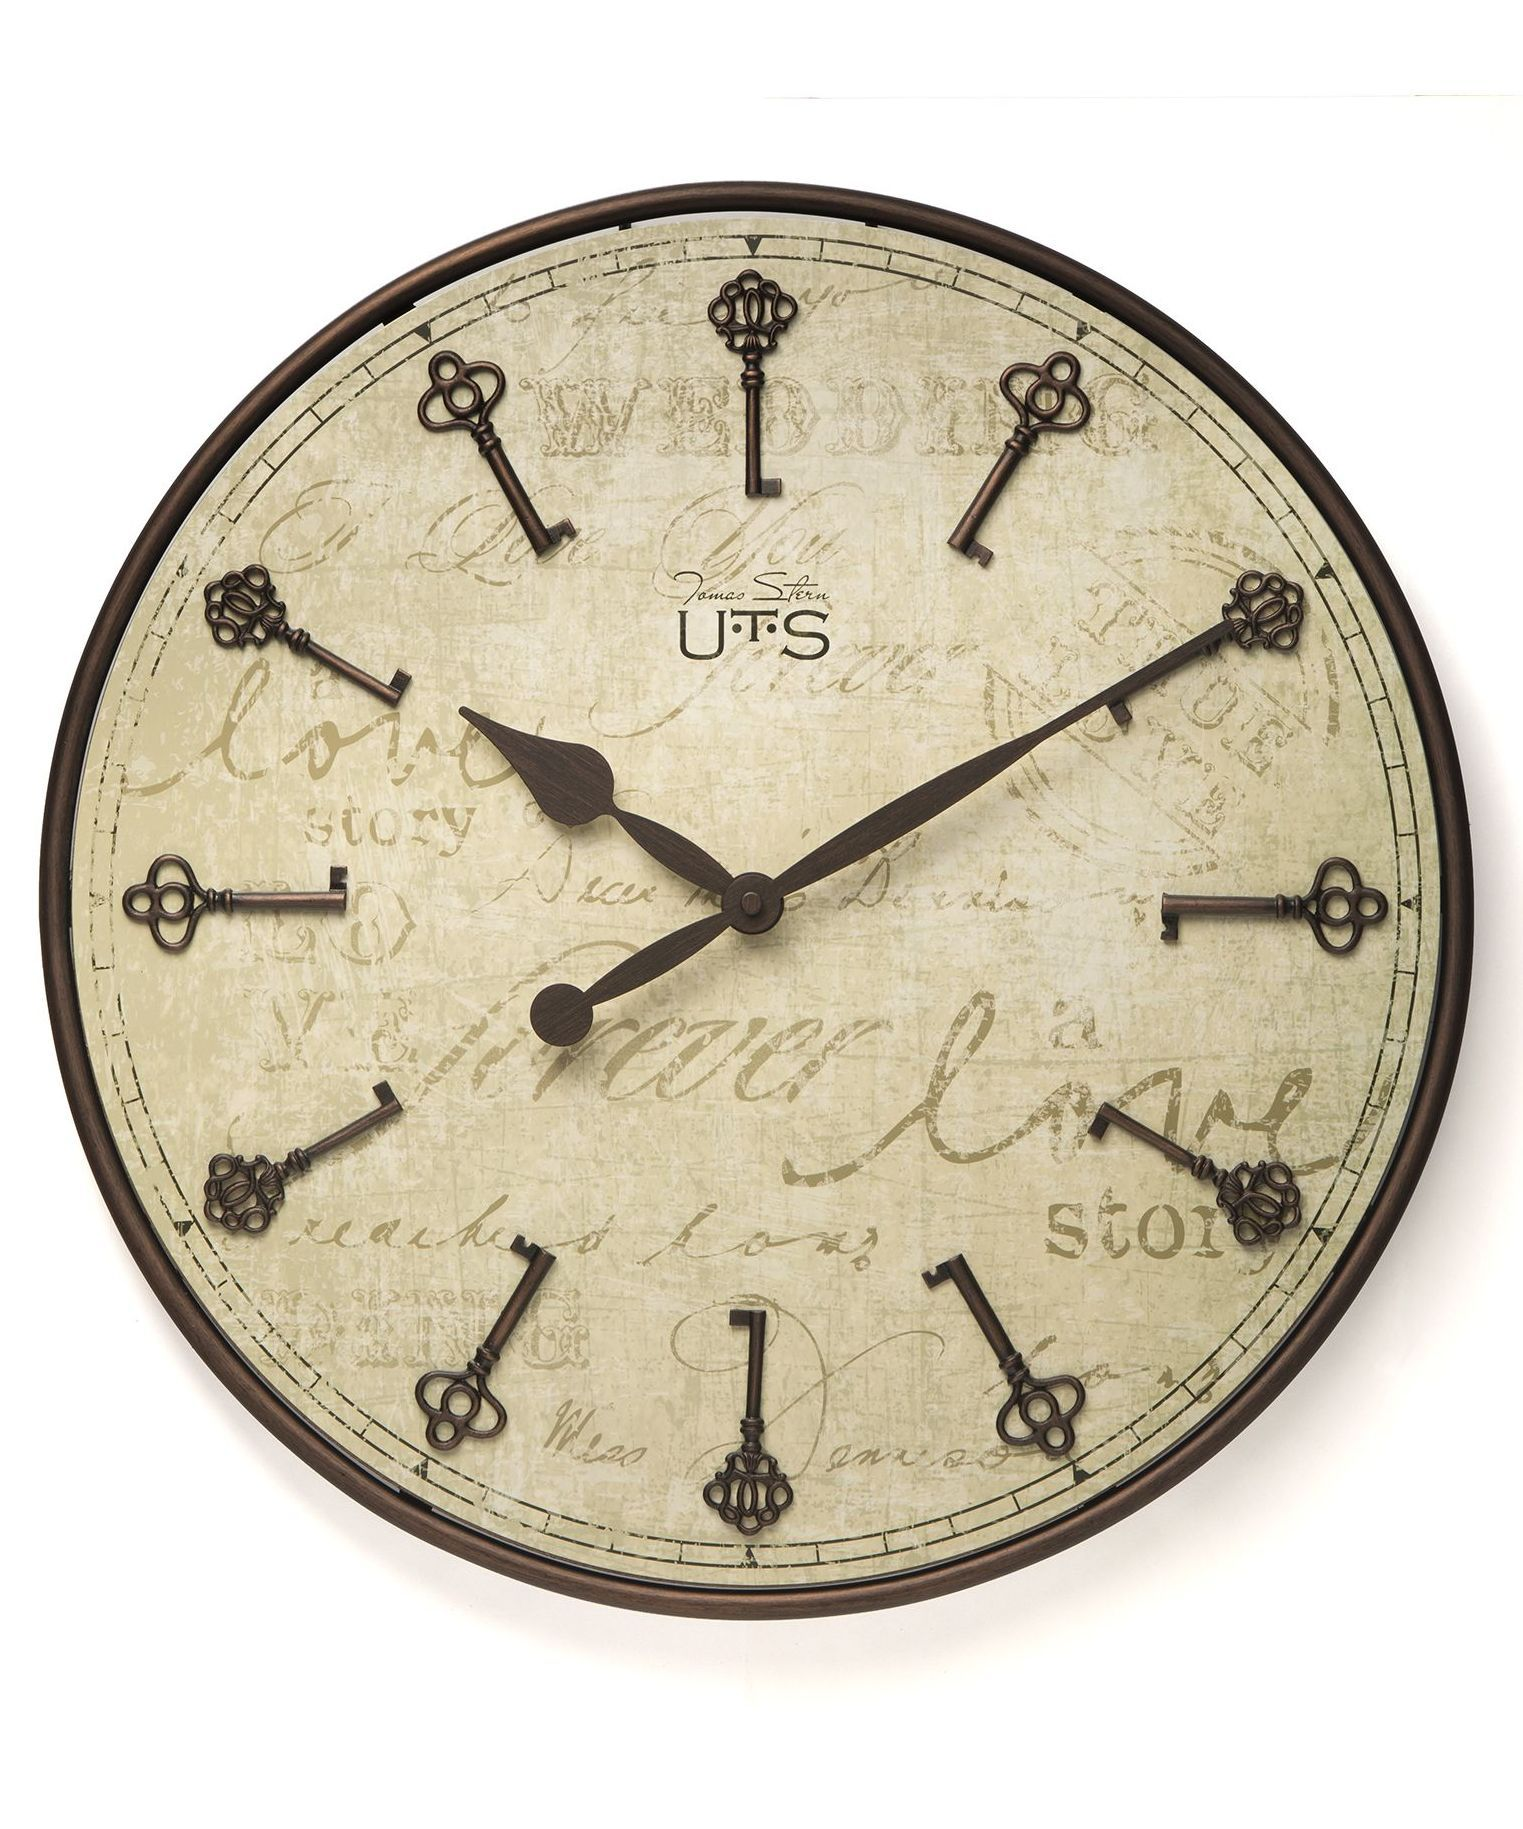 Часы настенные Часы настенные Tomas Stern 9009 chasy-nastennye-tomas-stern-9009-germaniya.jpg